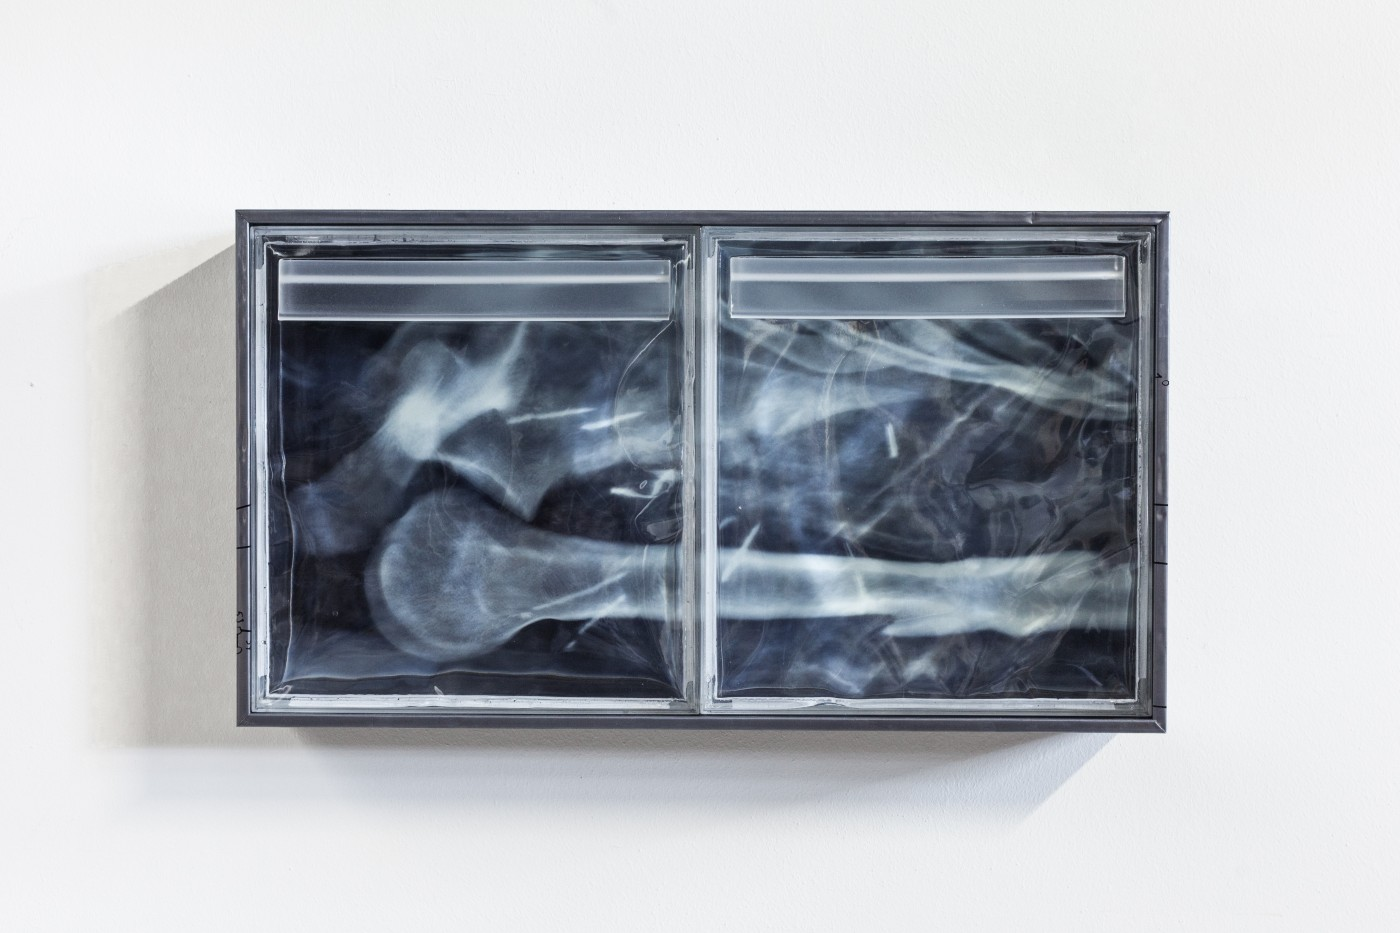 DEPOSIT  Deposits (palace of toil)</I>, 2015 Silkscreen on lead, inkjet print on acetate, UV resistant epoxy resin, aluminium panel 76 x 43 x 14 cm / 29.9 x 16.9 x 5.5 in   COOPER JACOBY